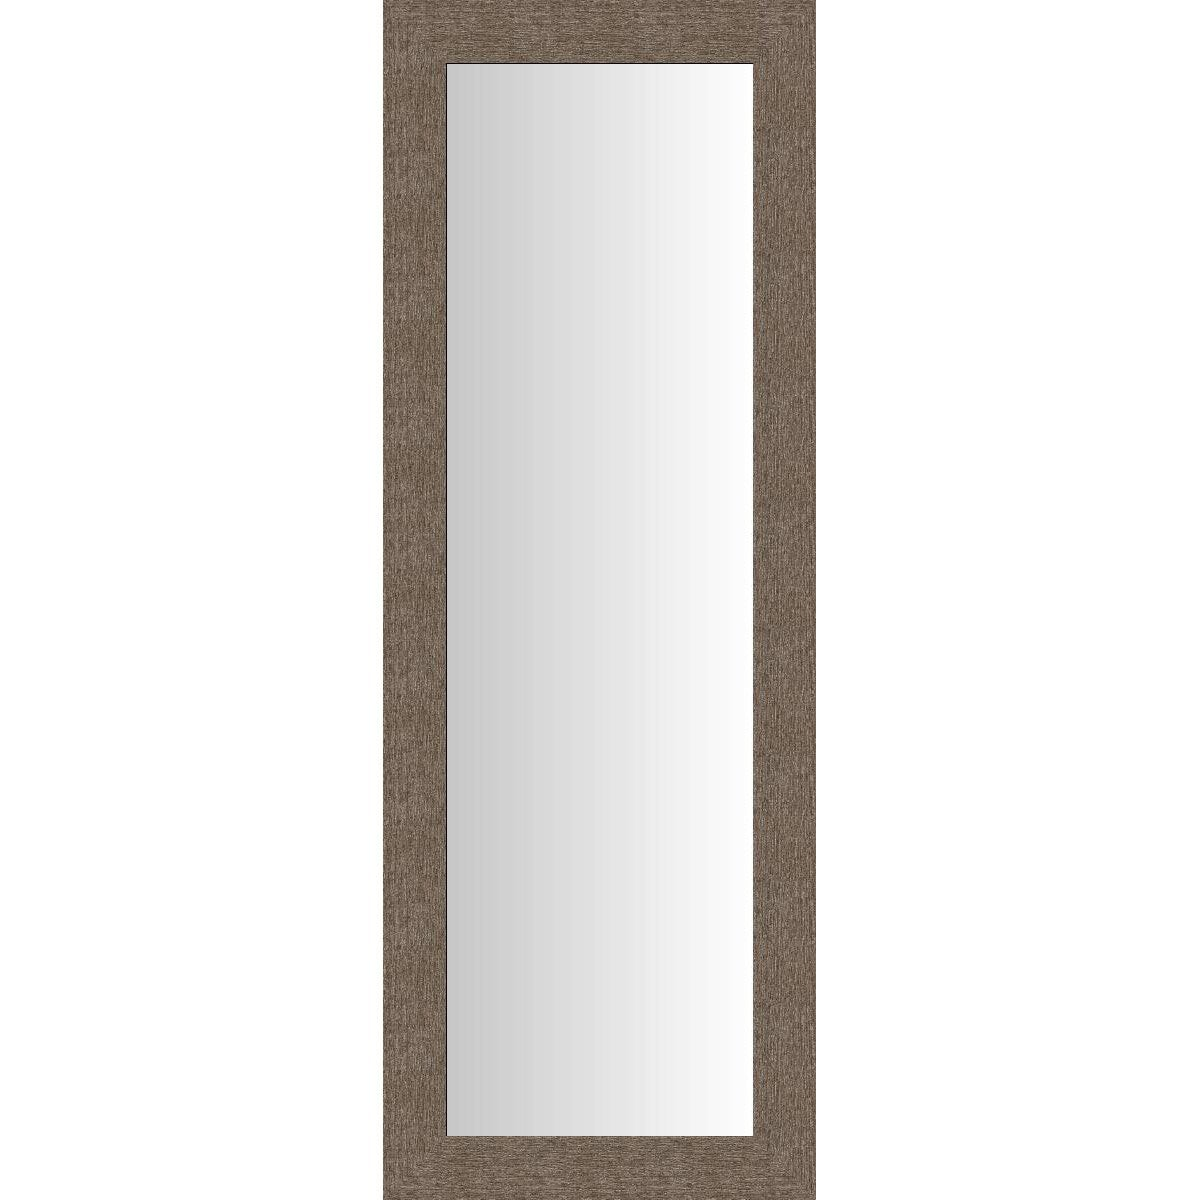 Miroir dublin brun 40x140 cm leroy merlin for Miroir 140 x 70